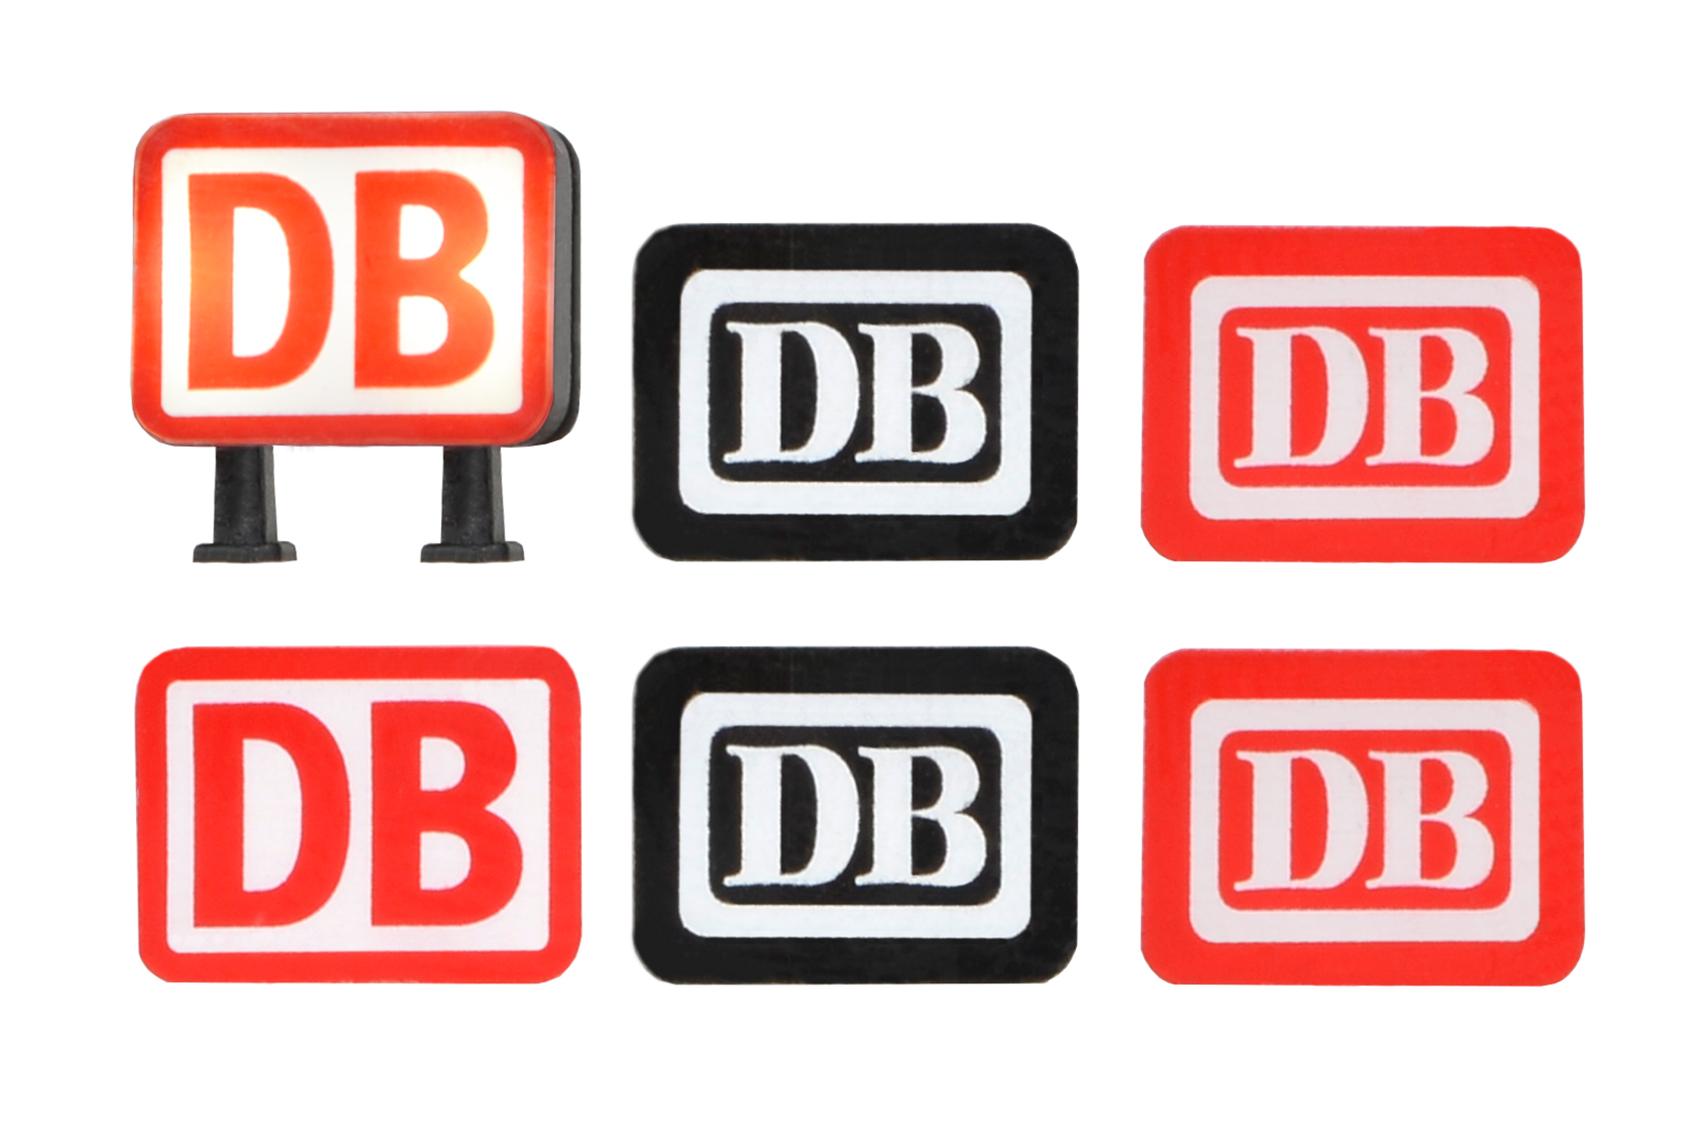 Viessmann 5875 <br/>DB Keks mit LED-Beleuchtung weiß